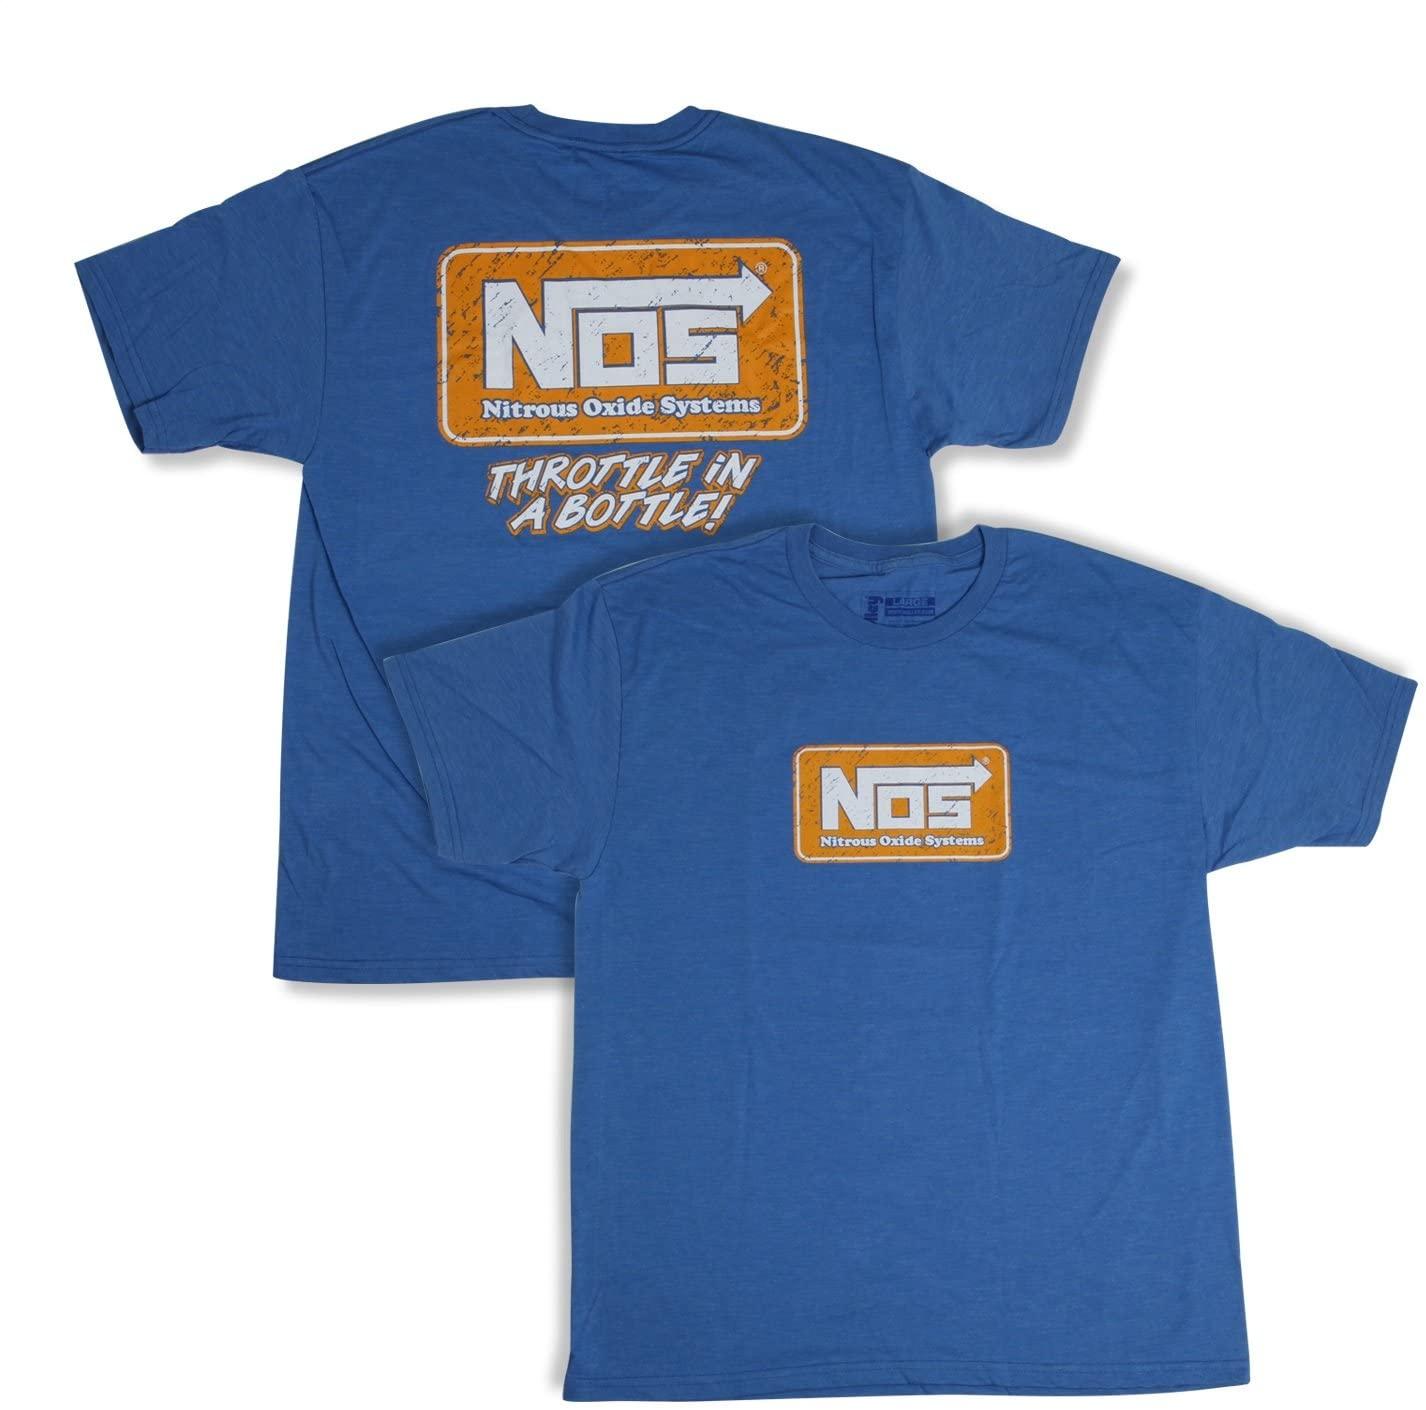 NOS/Nitrous Oxide System 19071-XXXLNOS T-Shirt NOS Logo Blue Unisex XXX-Large T-Shirt